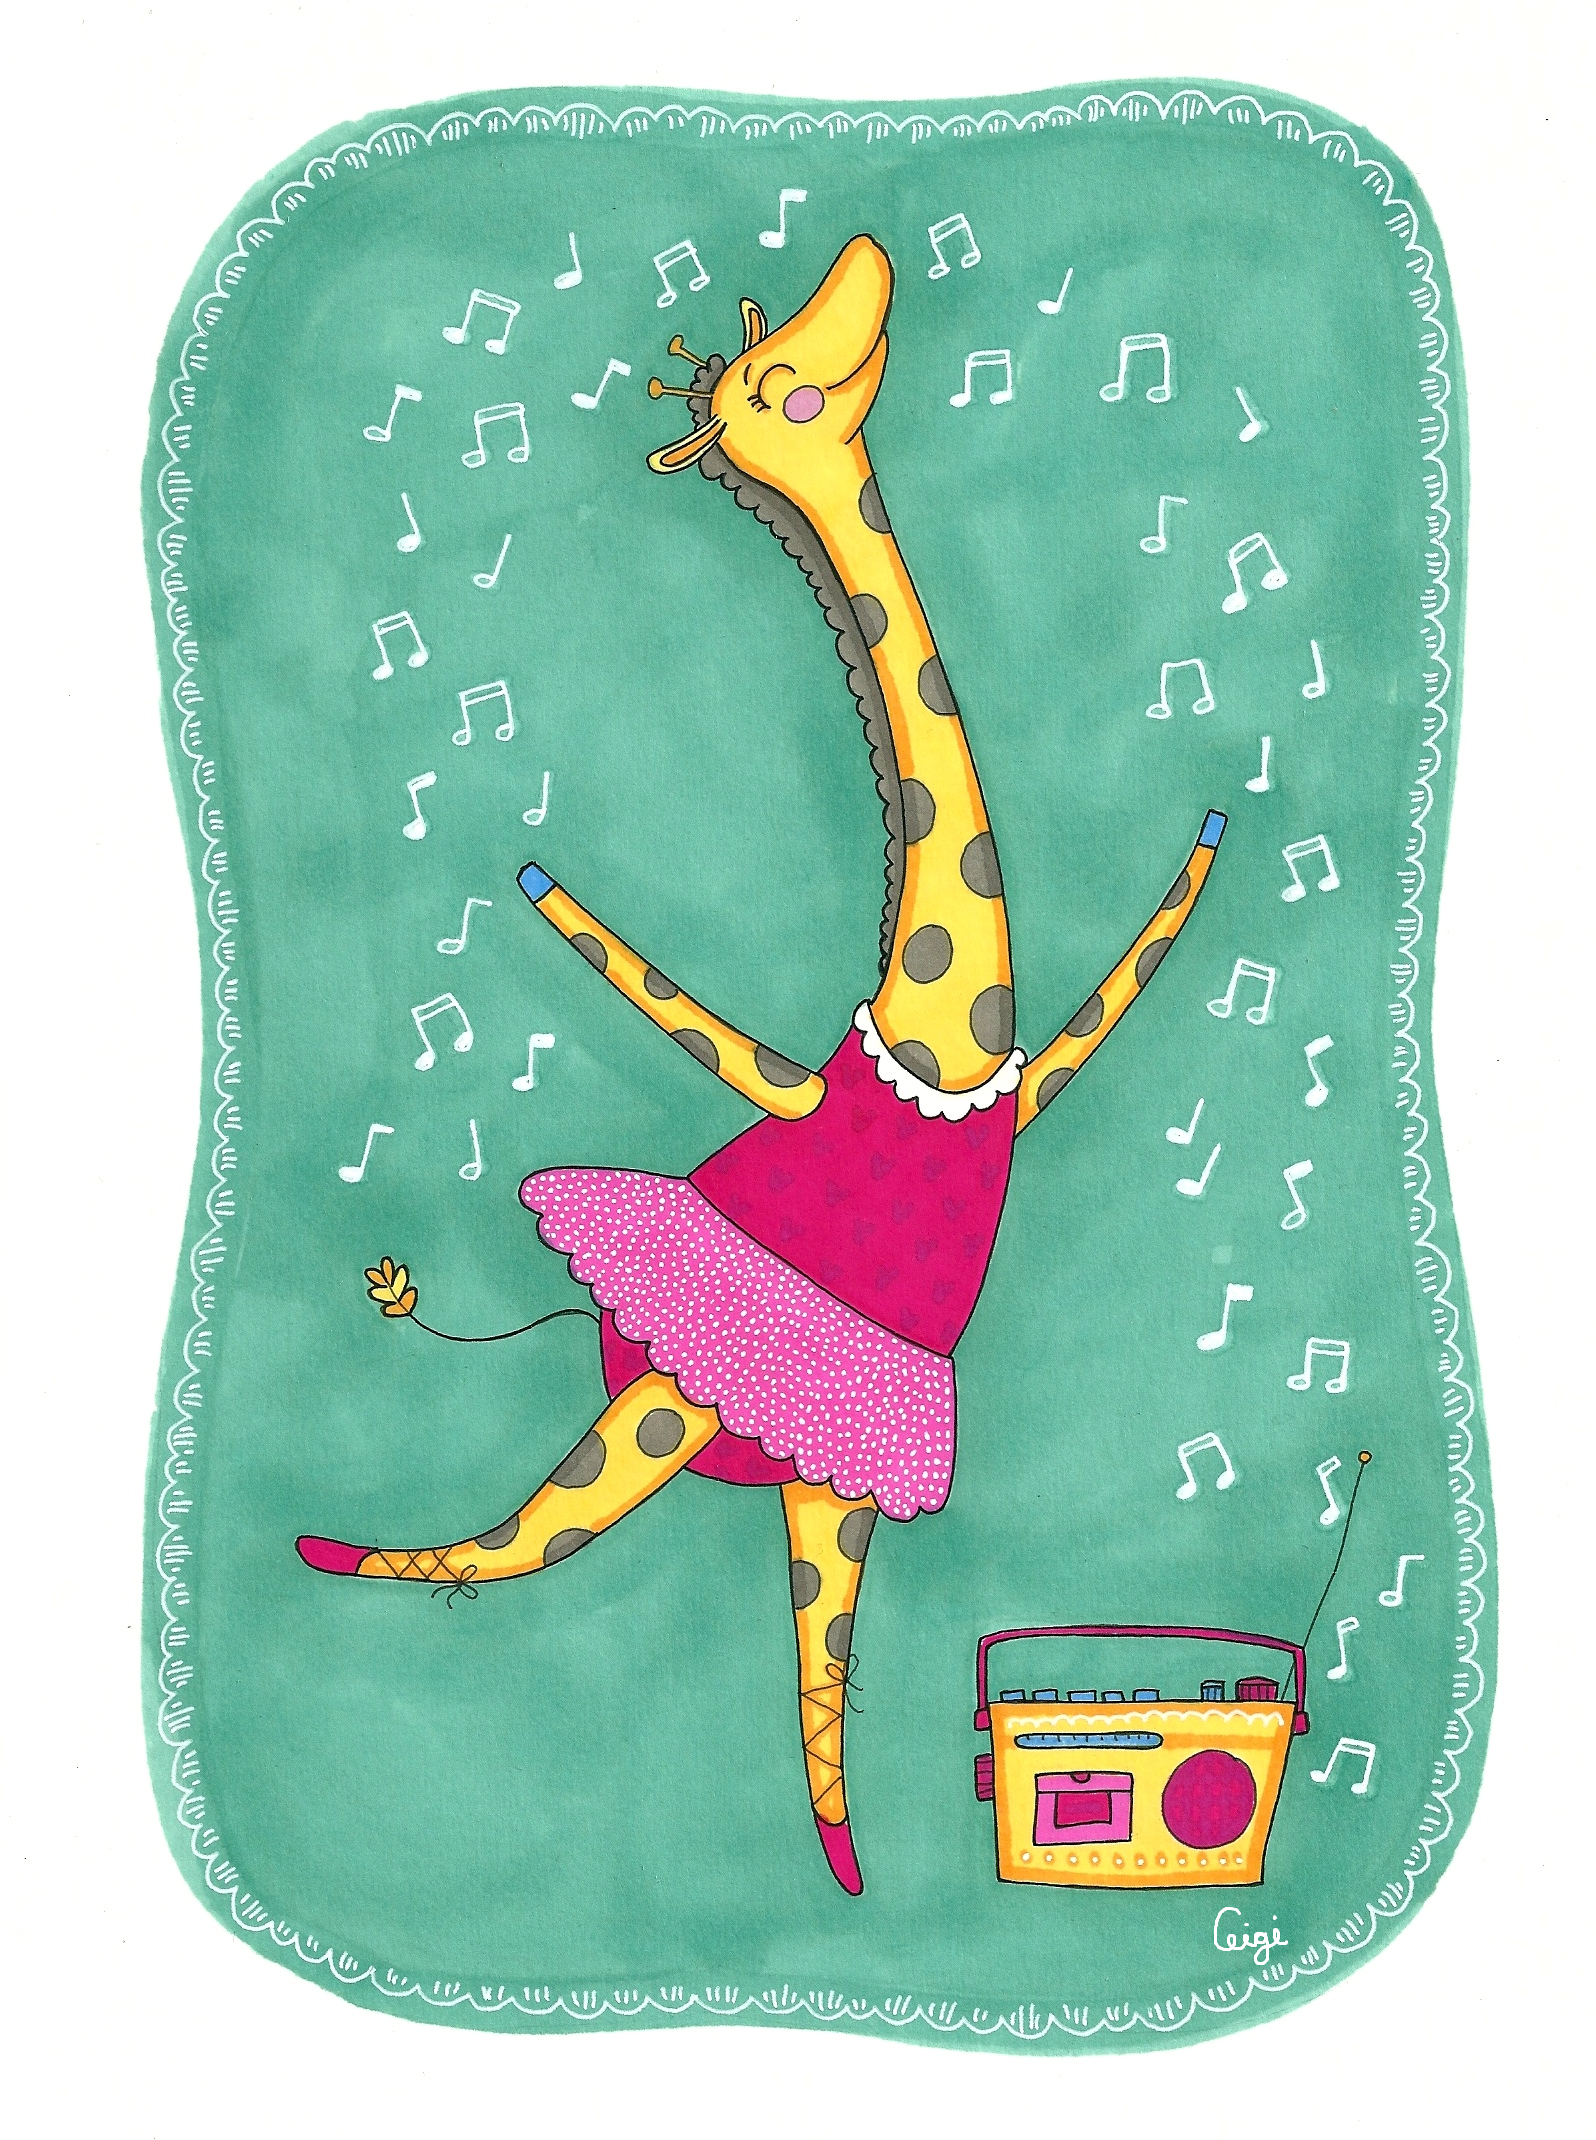 kirahvi tanssii